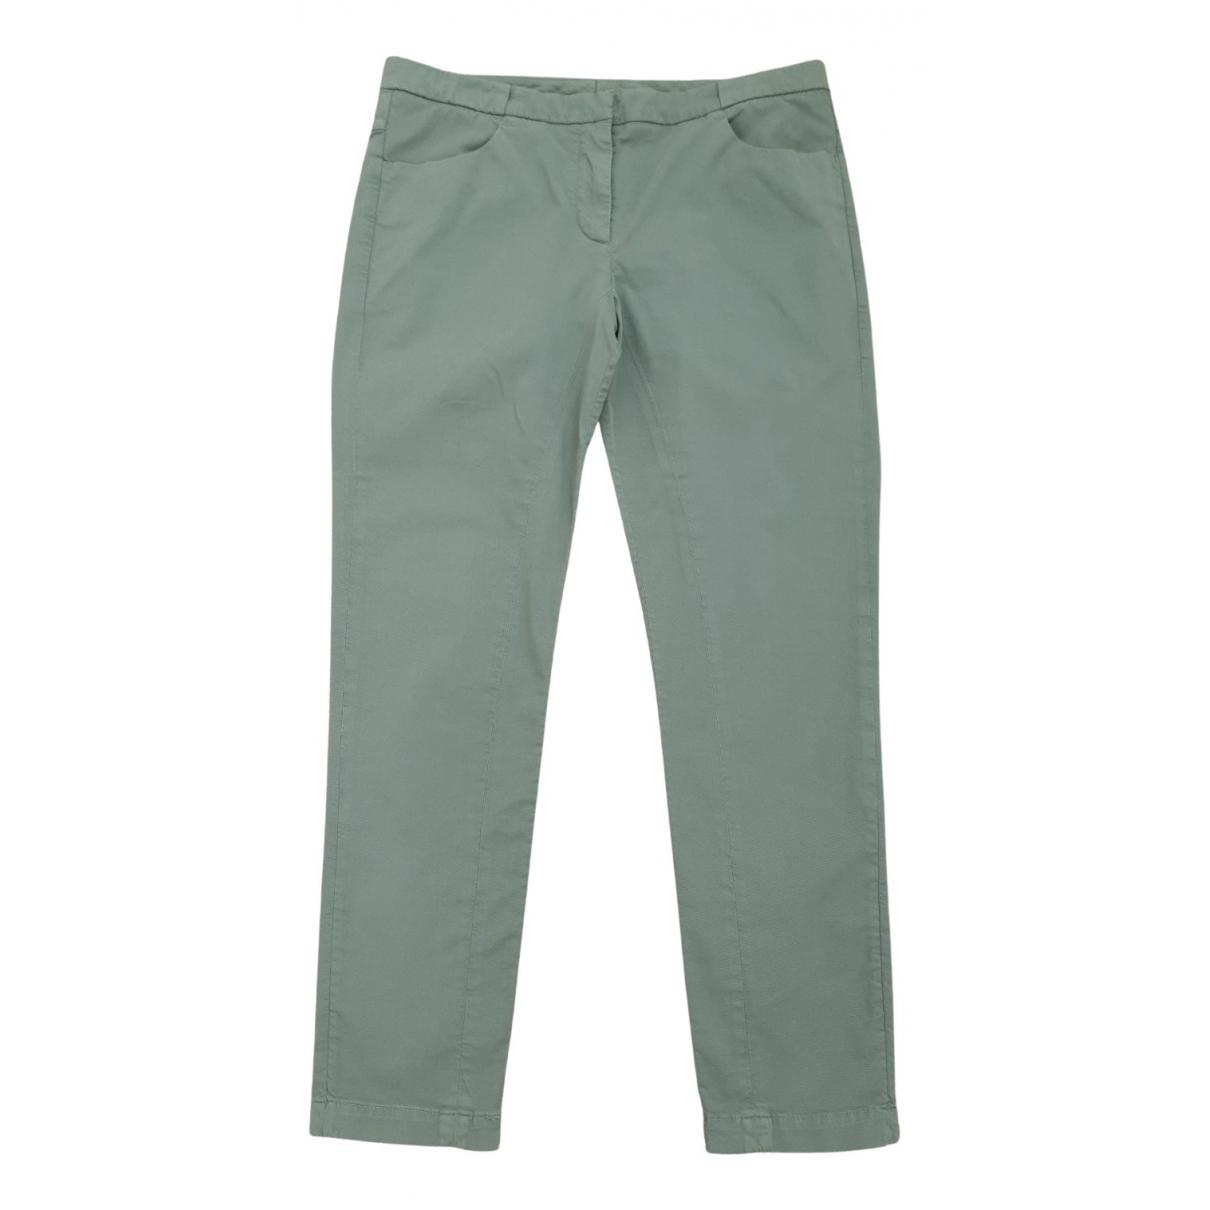 Brunello Cucinelli N Green Cotton Trousers for Women 40 FR